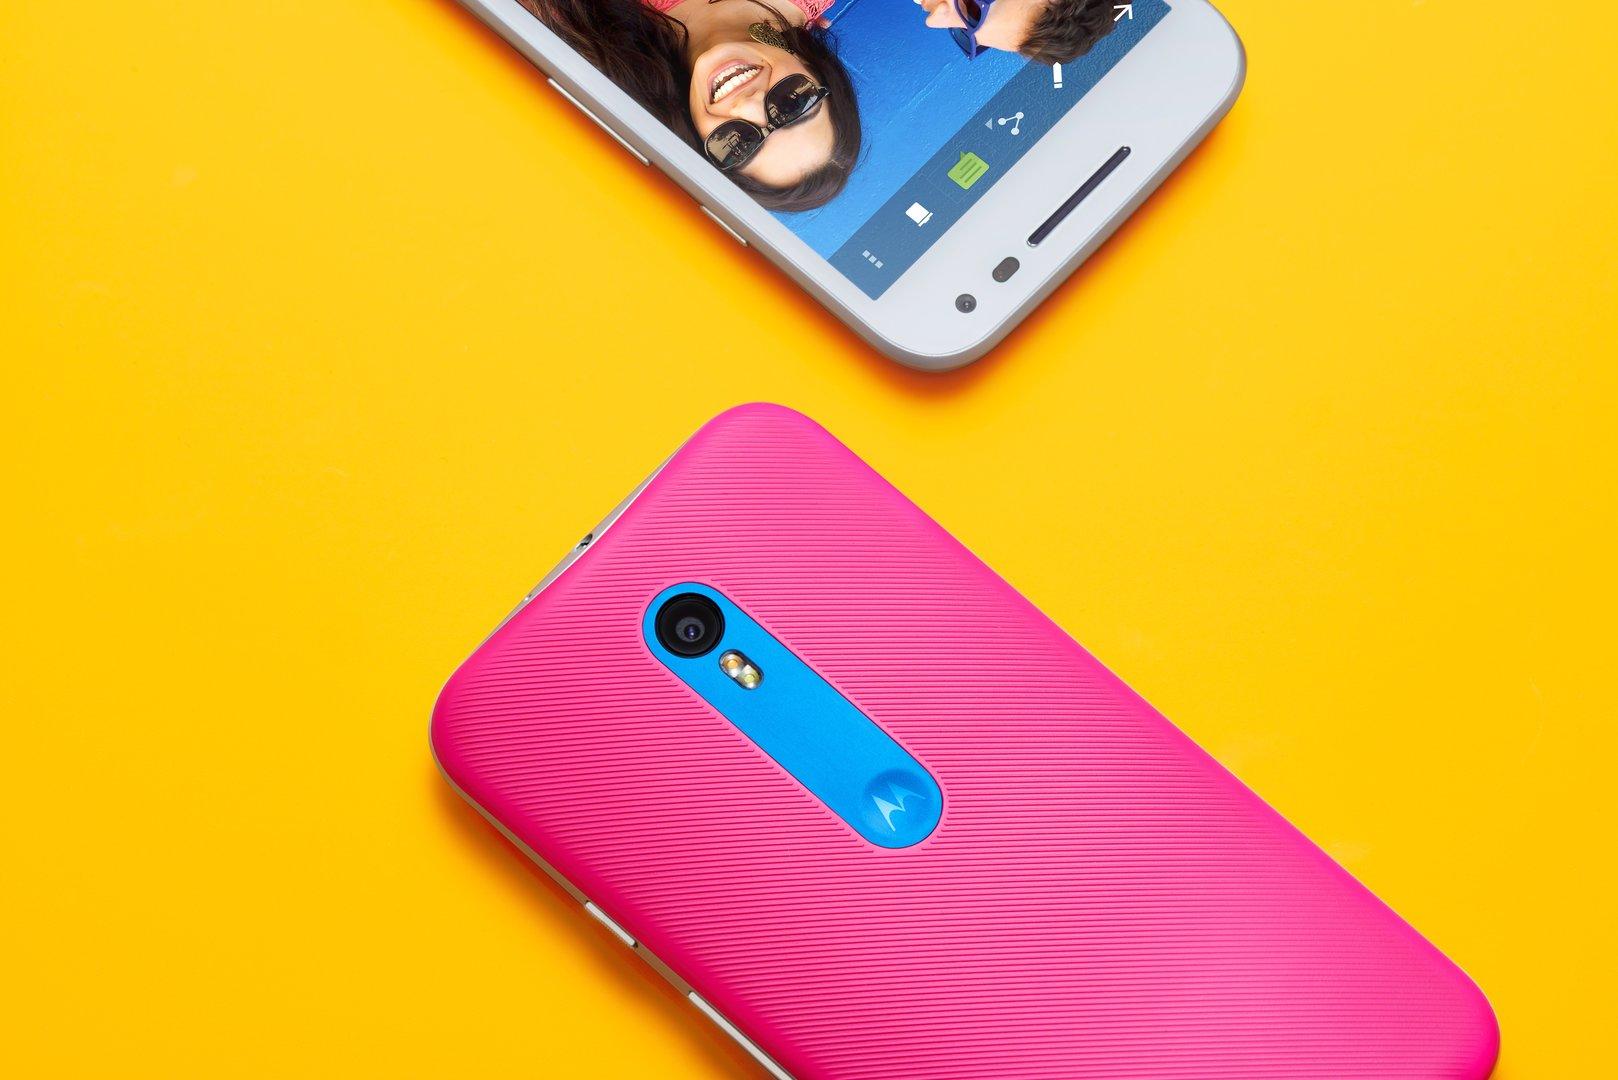 Motorola Moto G (2015)